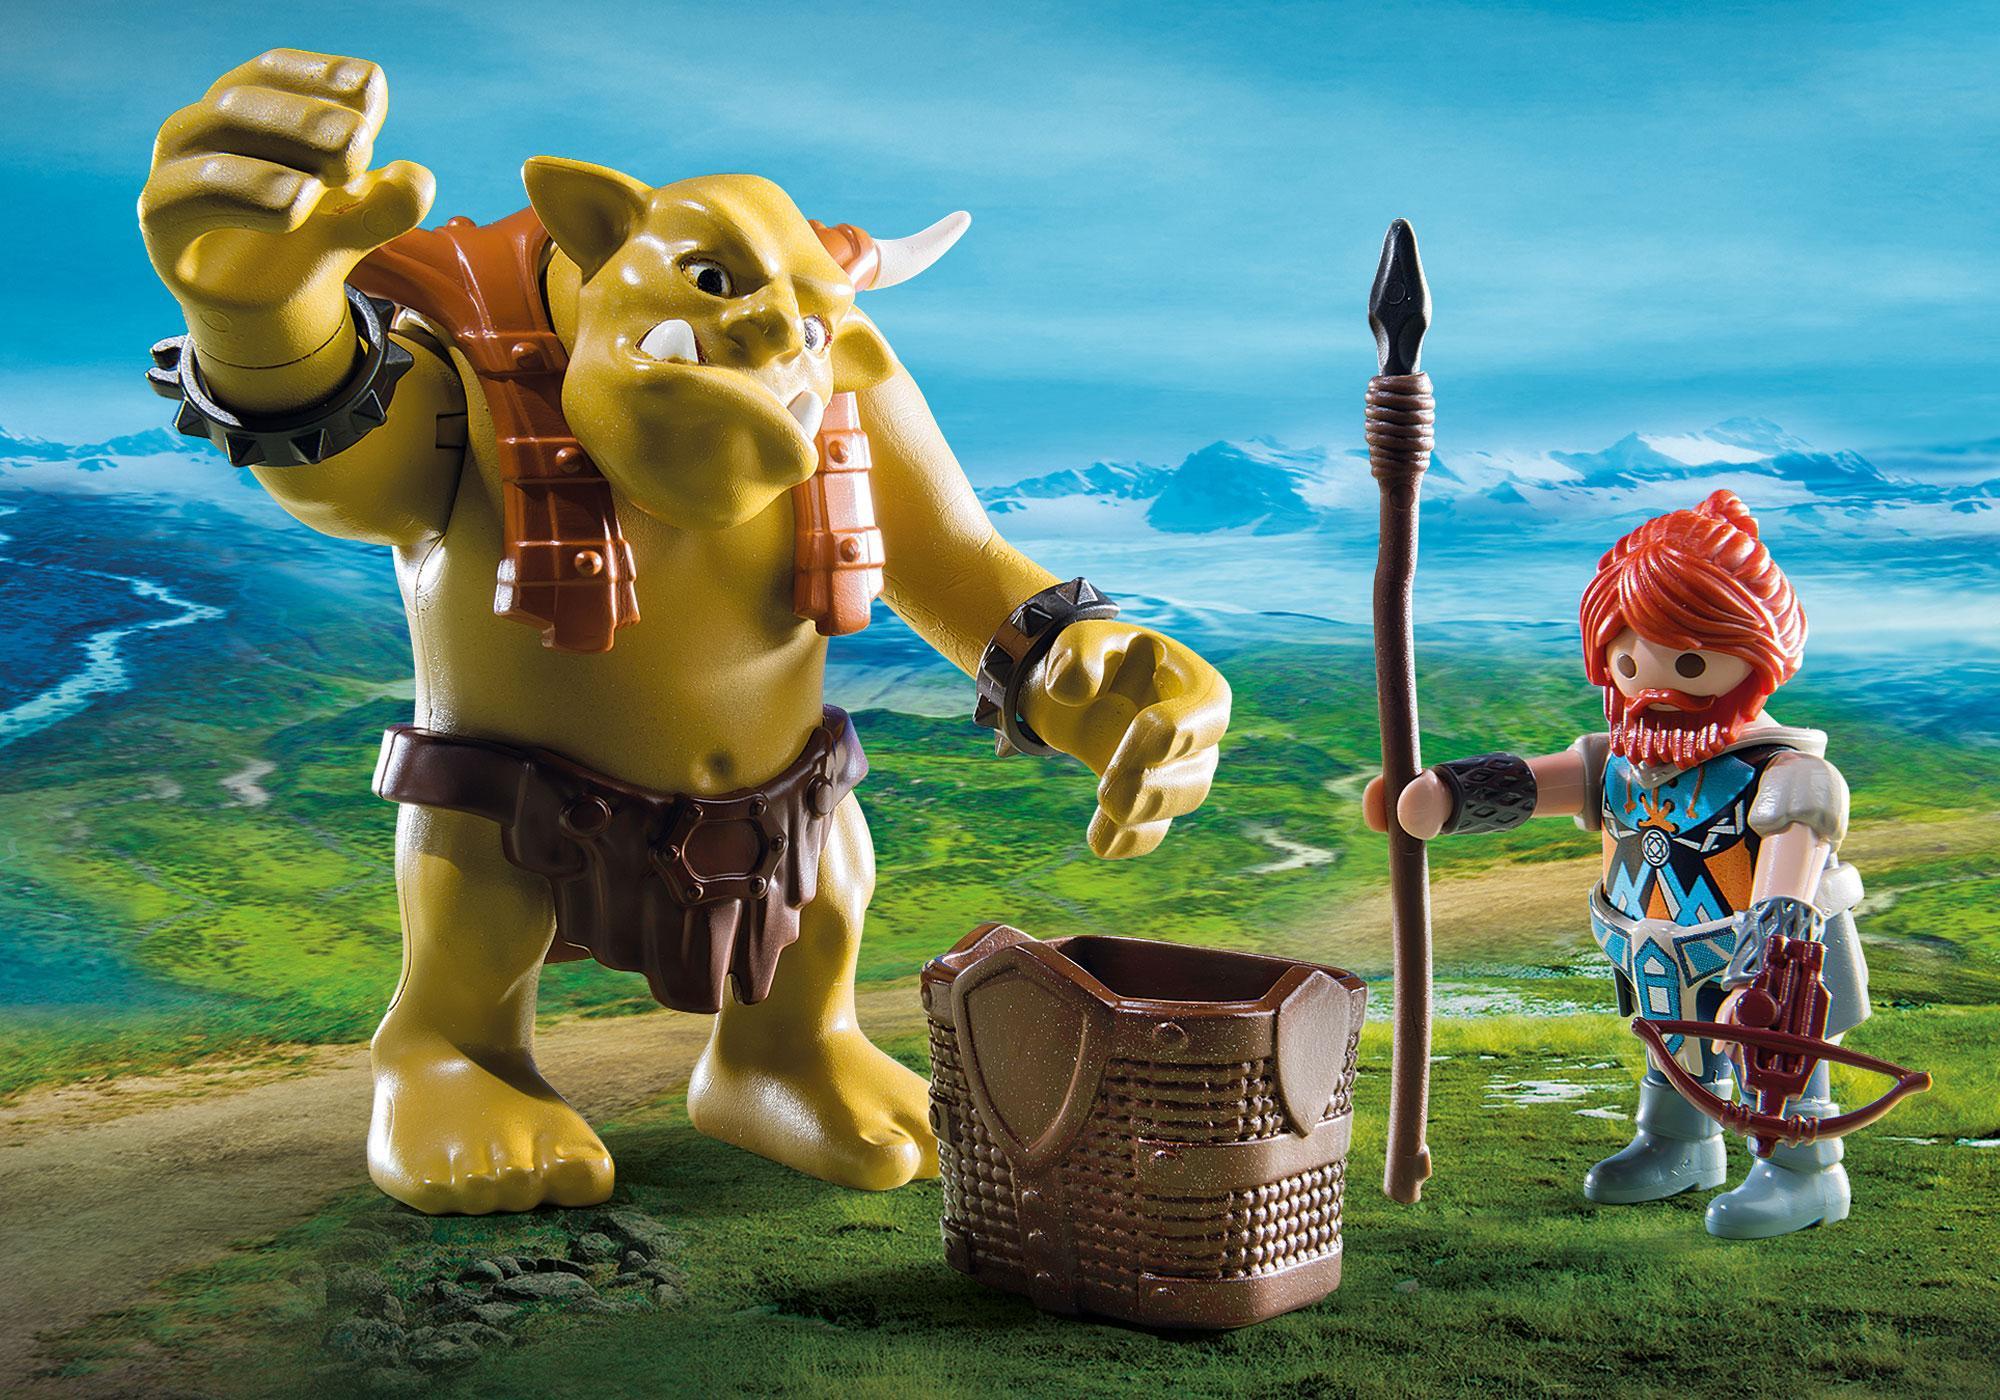 http://media.playmobil.com/i/playmobil/9343_product_extra1/Troll géant et soldat nain